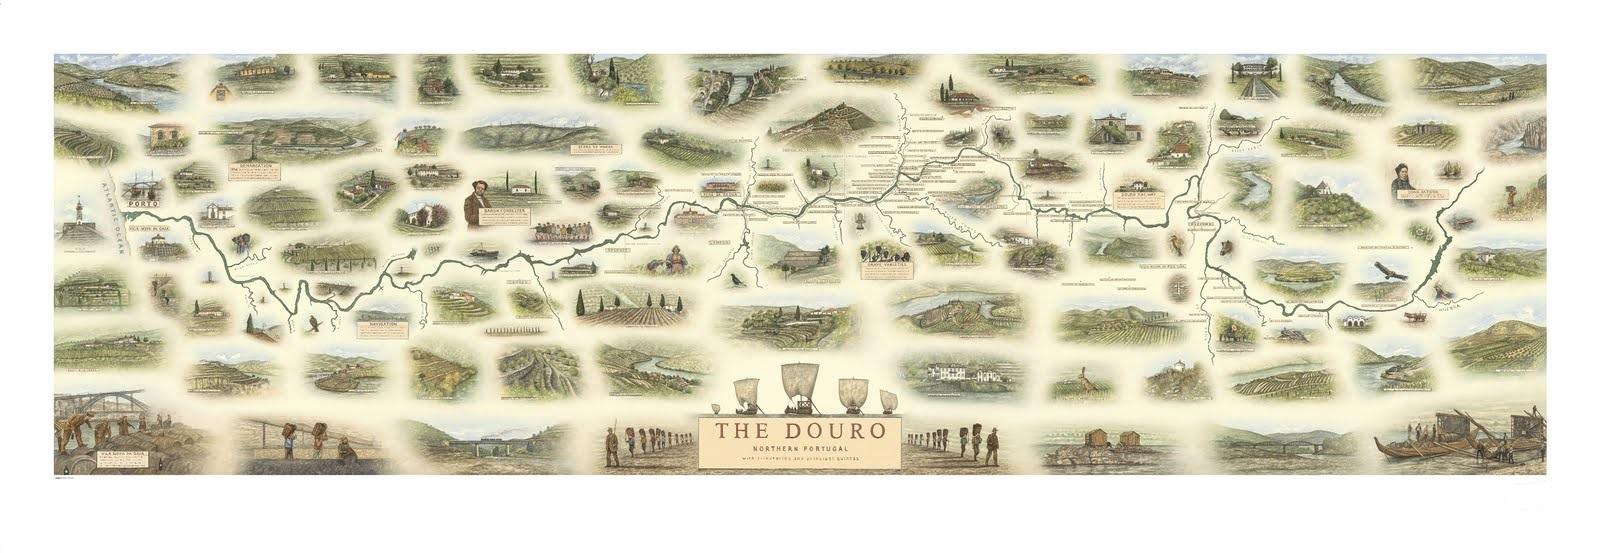 O novo mapa ilustrado do douro